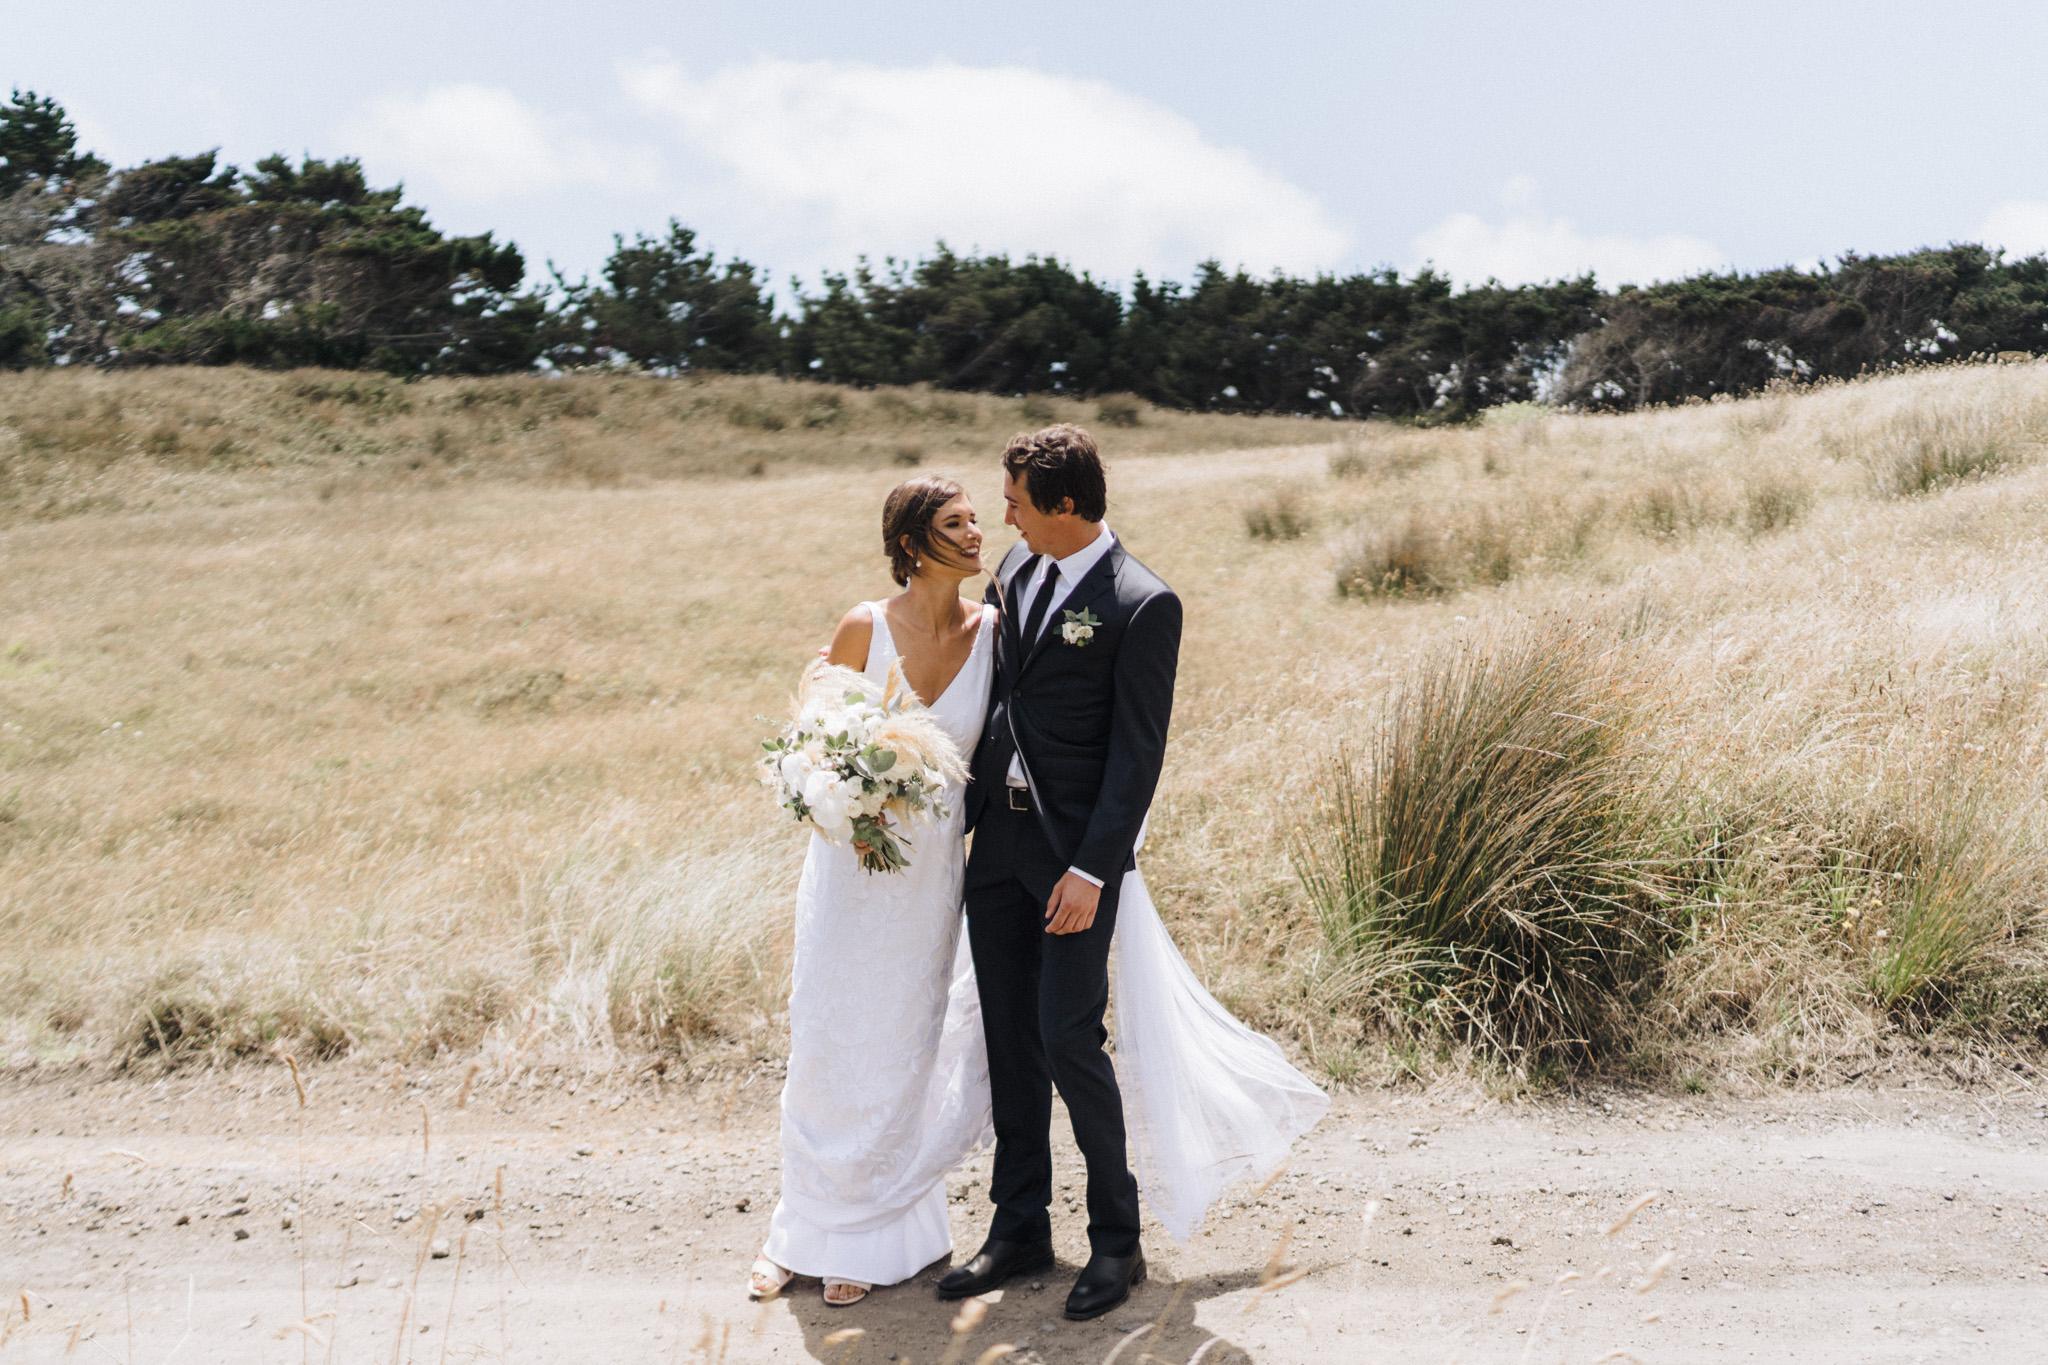 newfound-h-m-castaways-waiuku-auckland-wedding-photographer-36